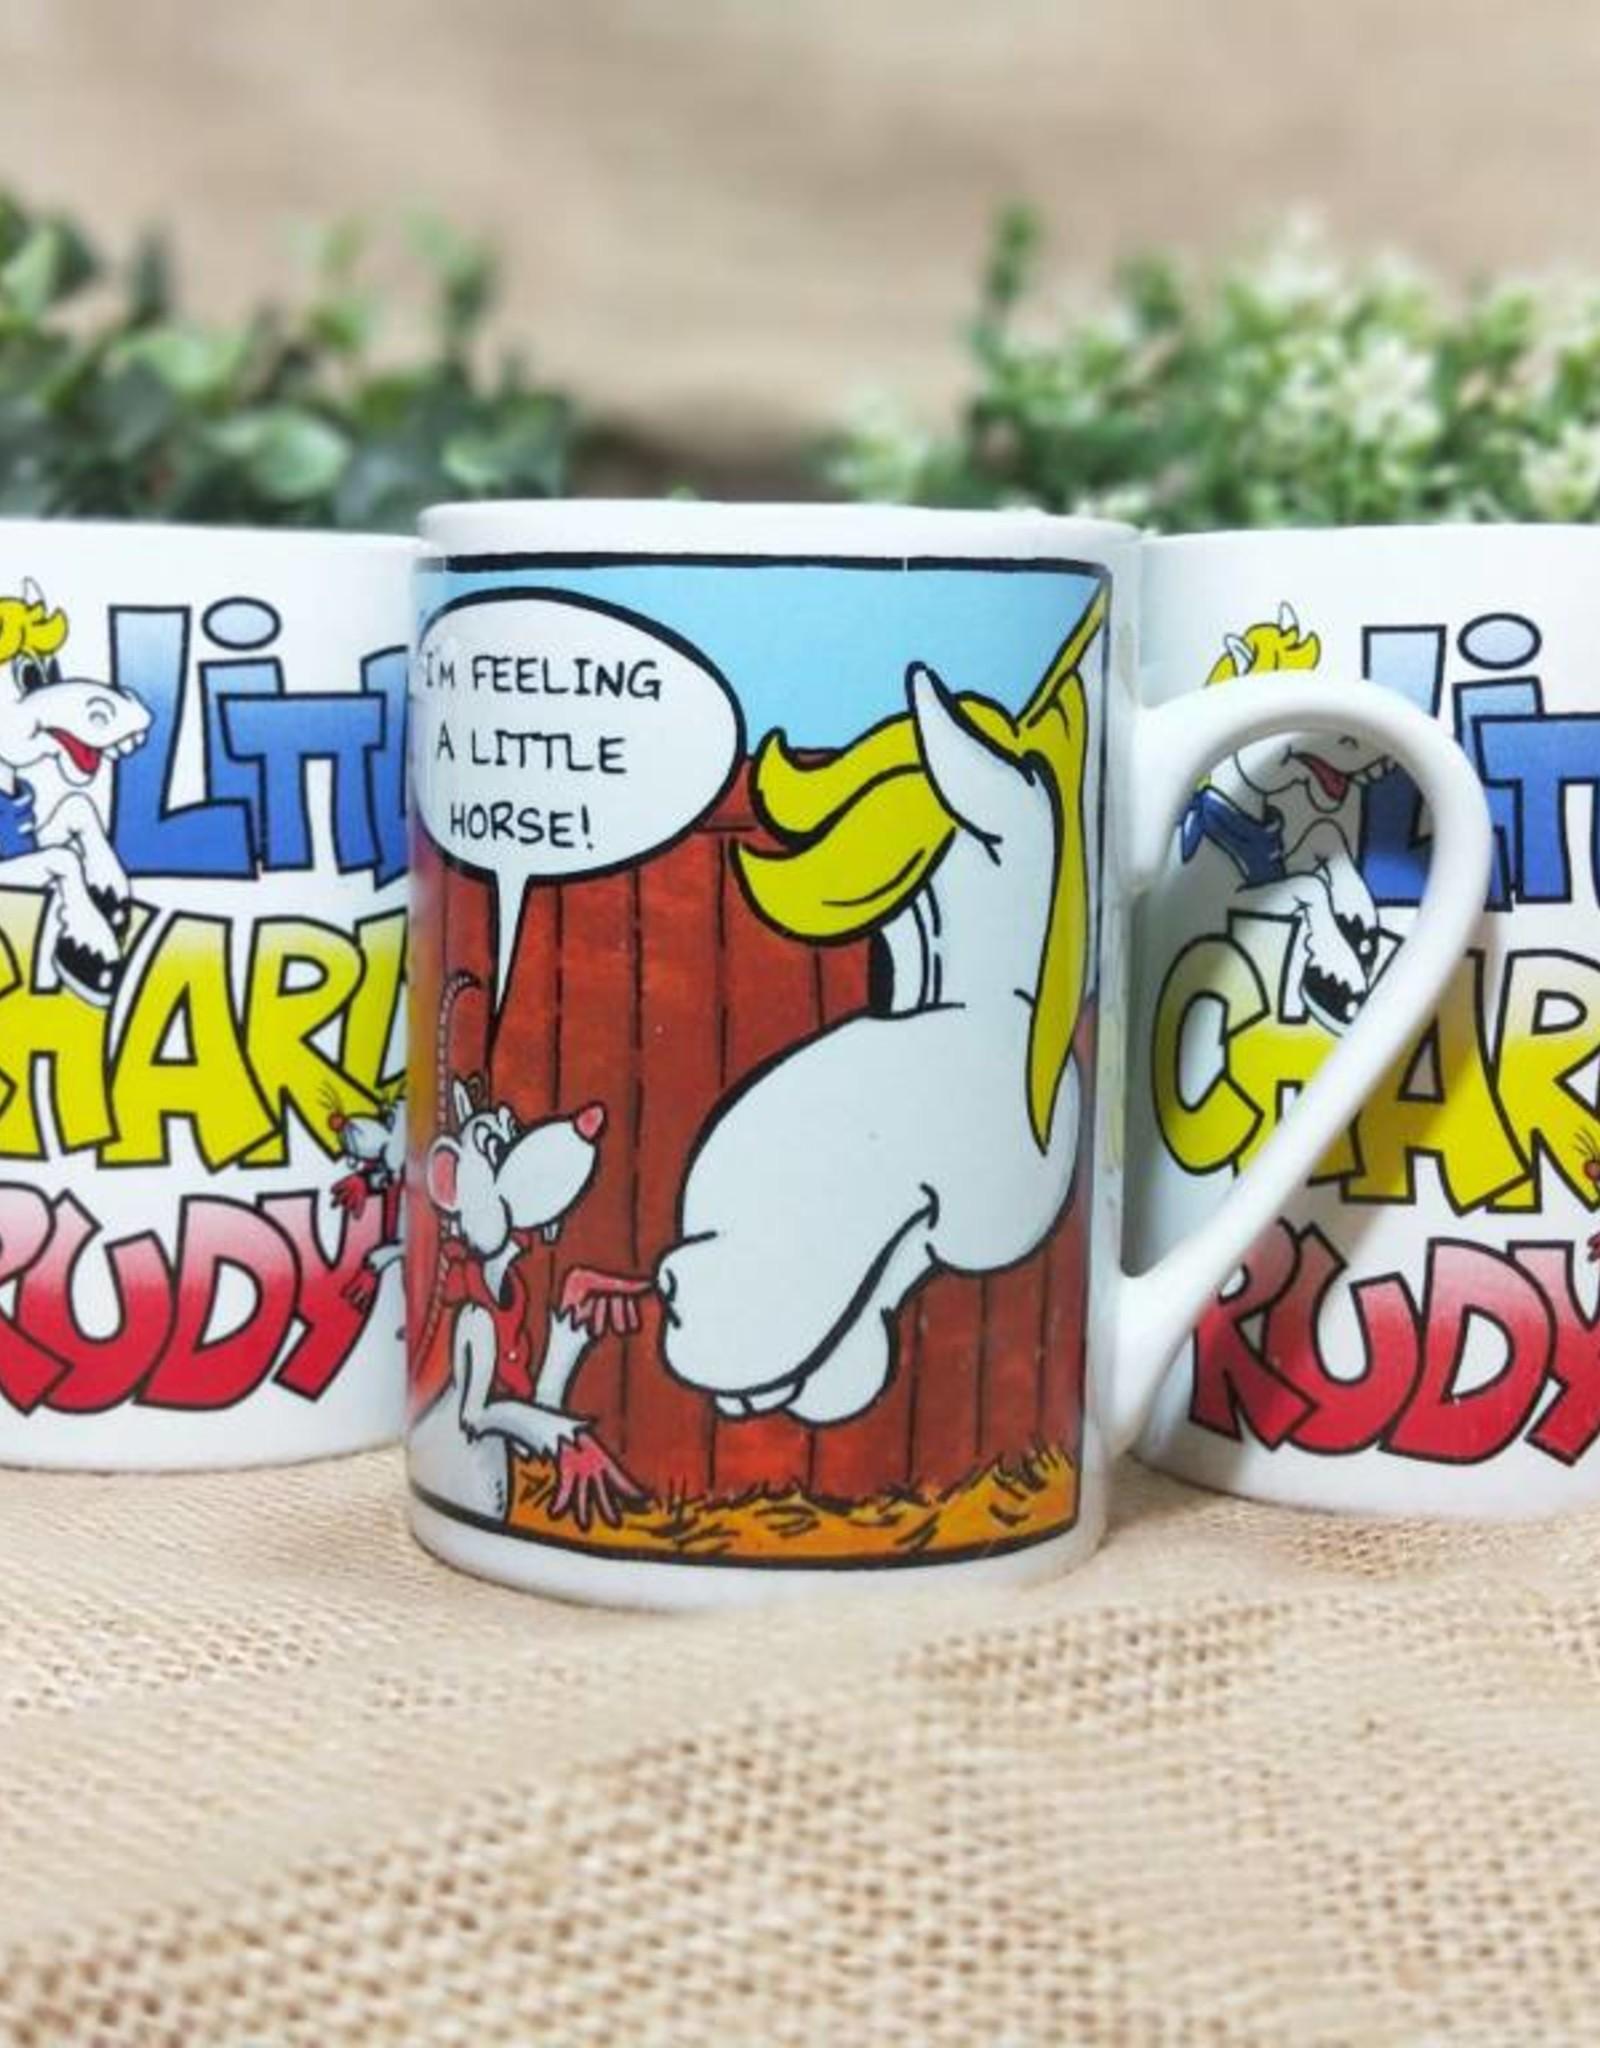 Little Charlie Rudy 'Feeling A Little Horse' Mug